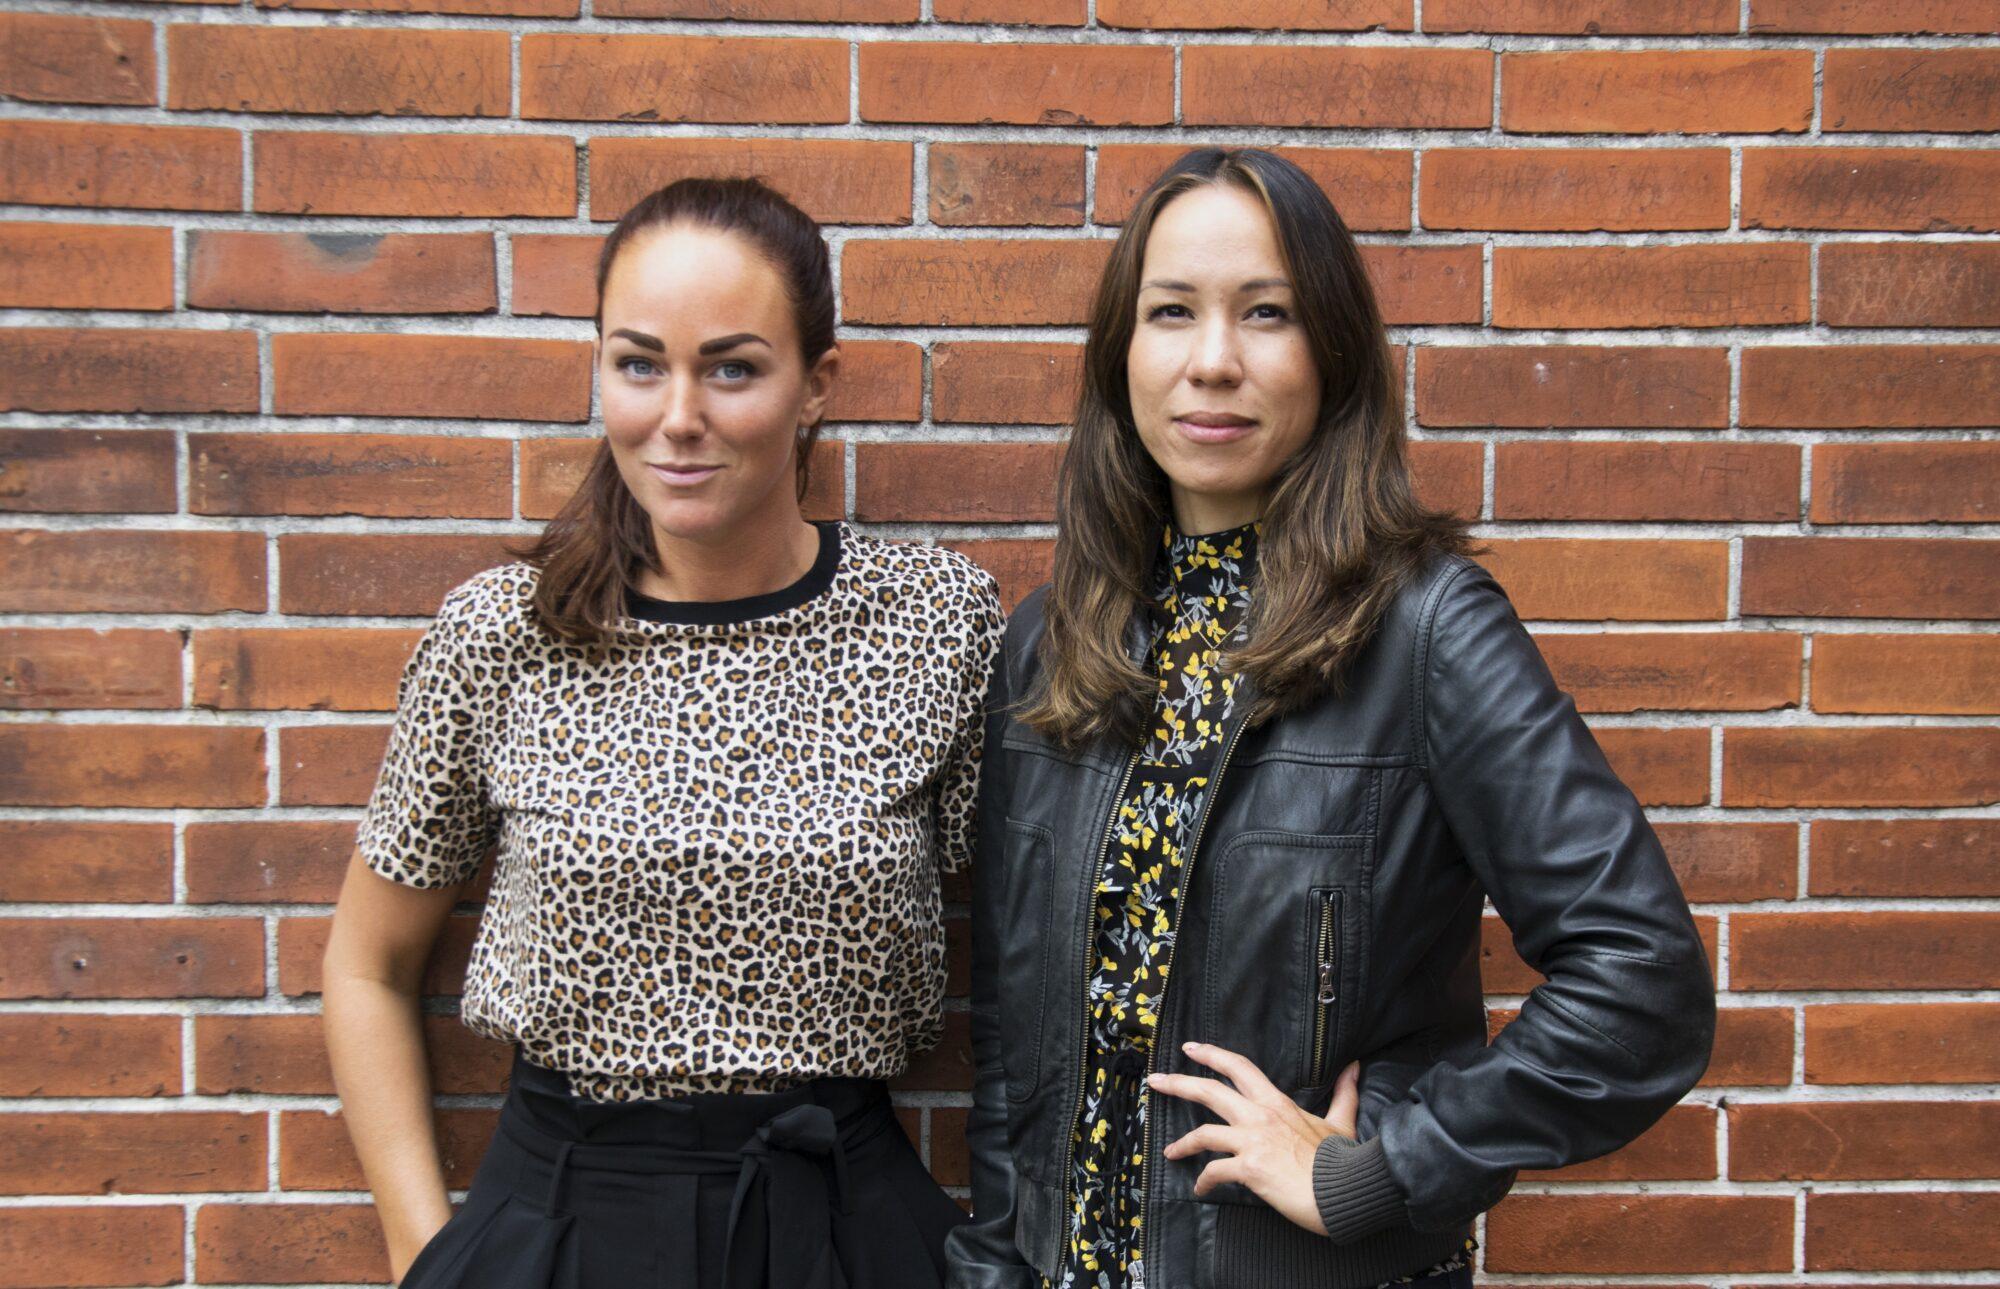 Antalet kvinnliga entreprenörer dalar: Krisworkshop i Malmö 1